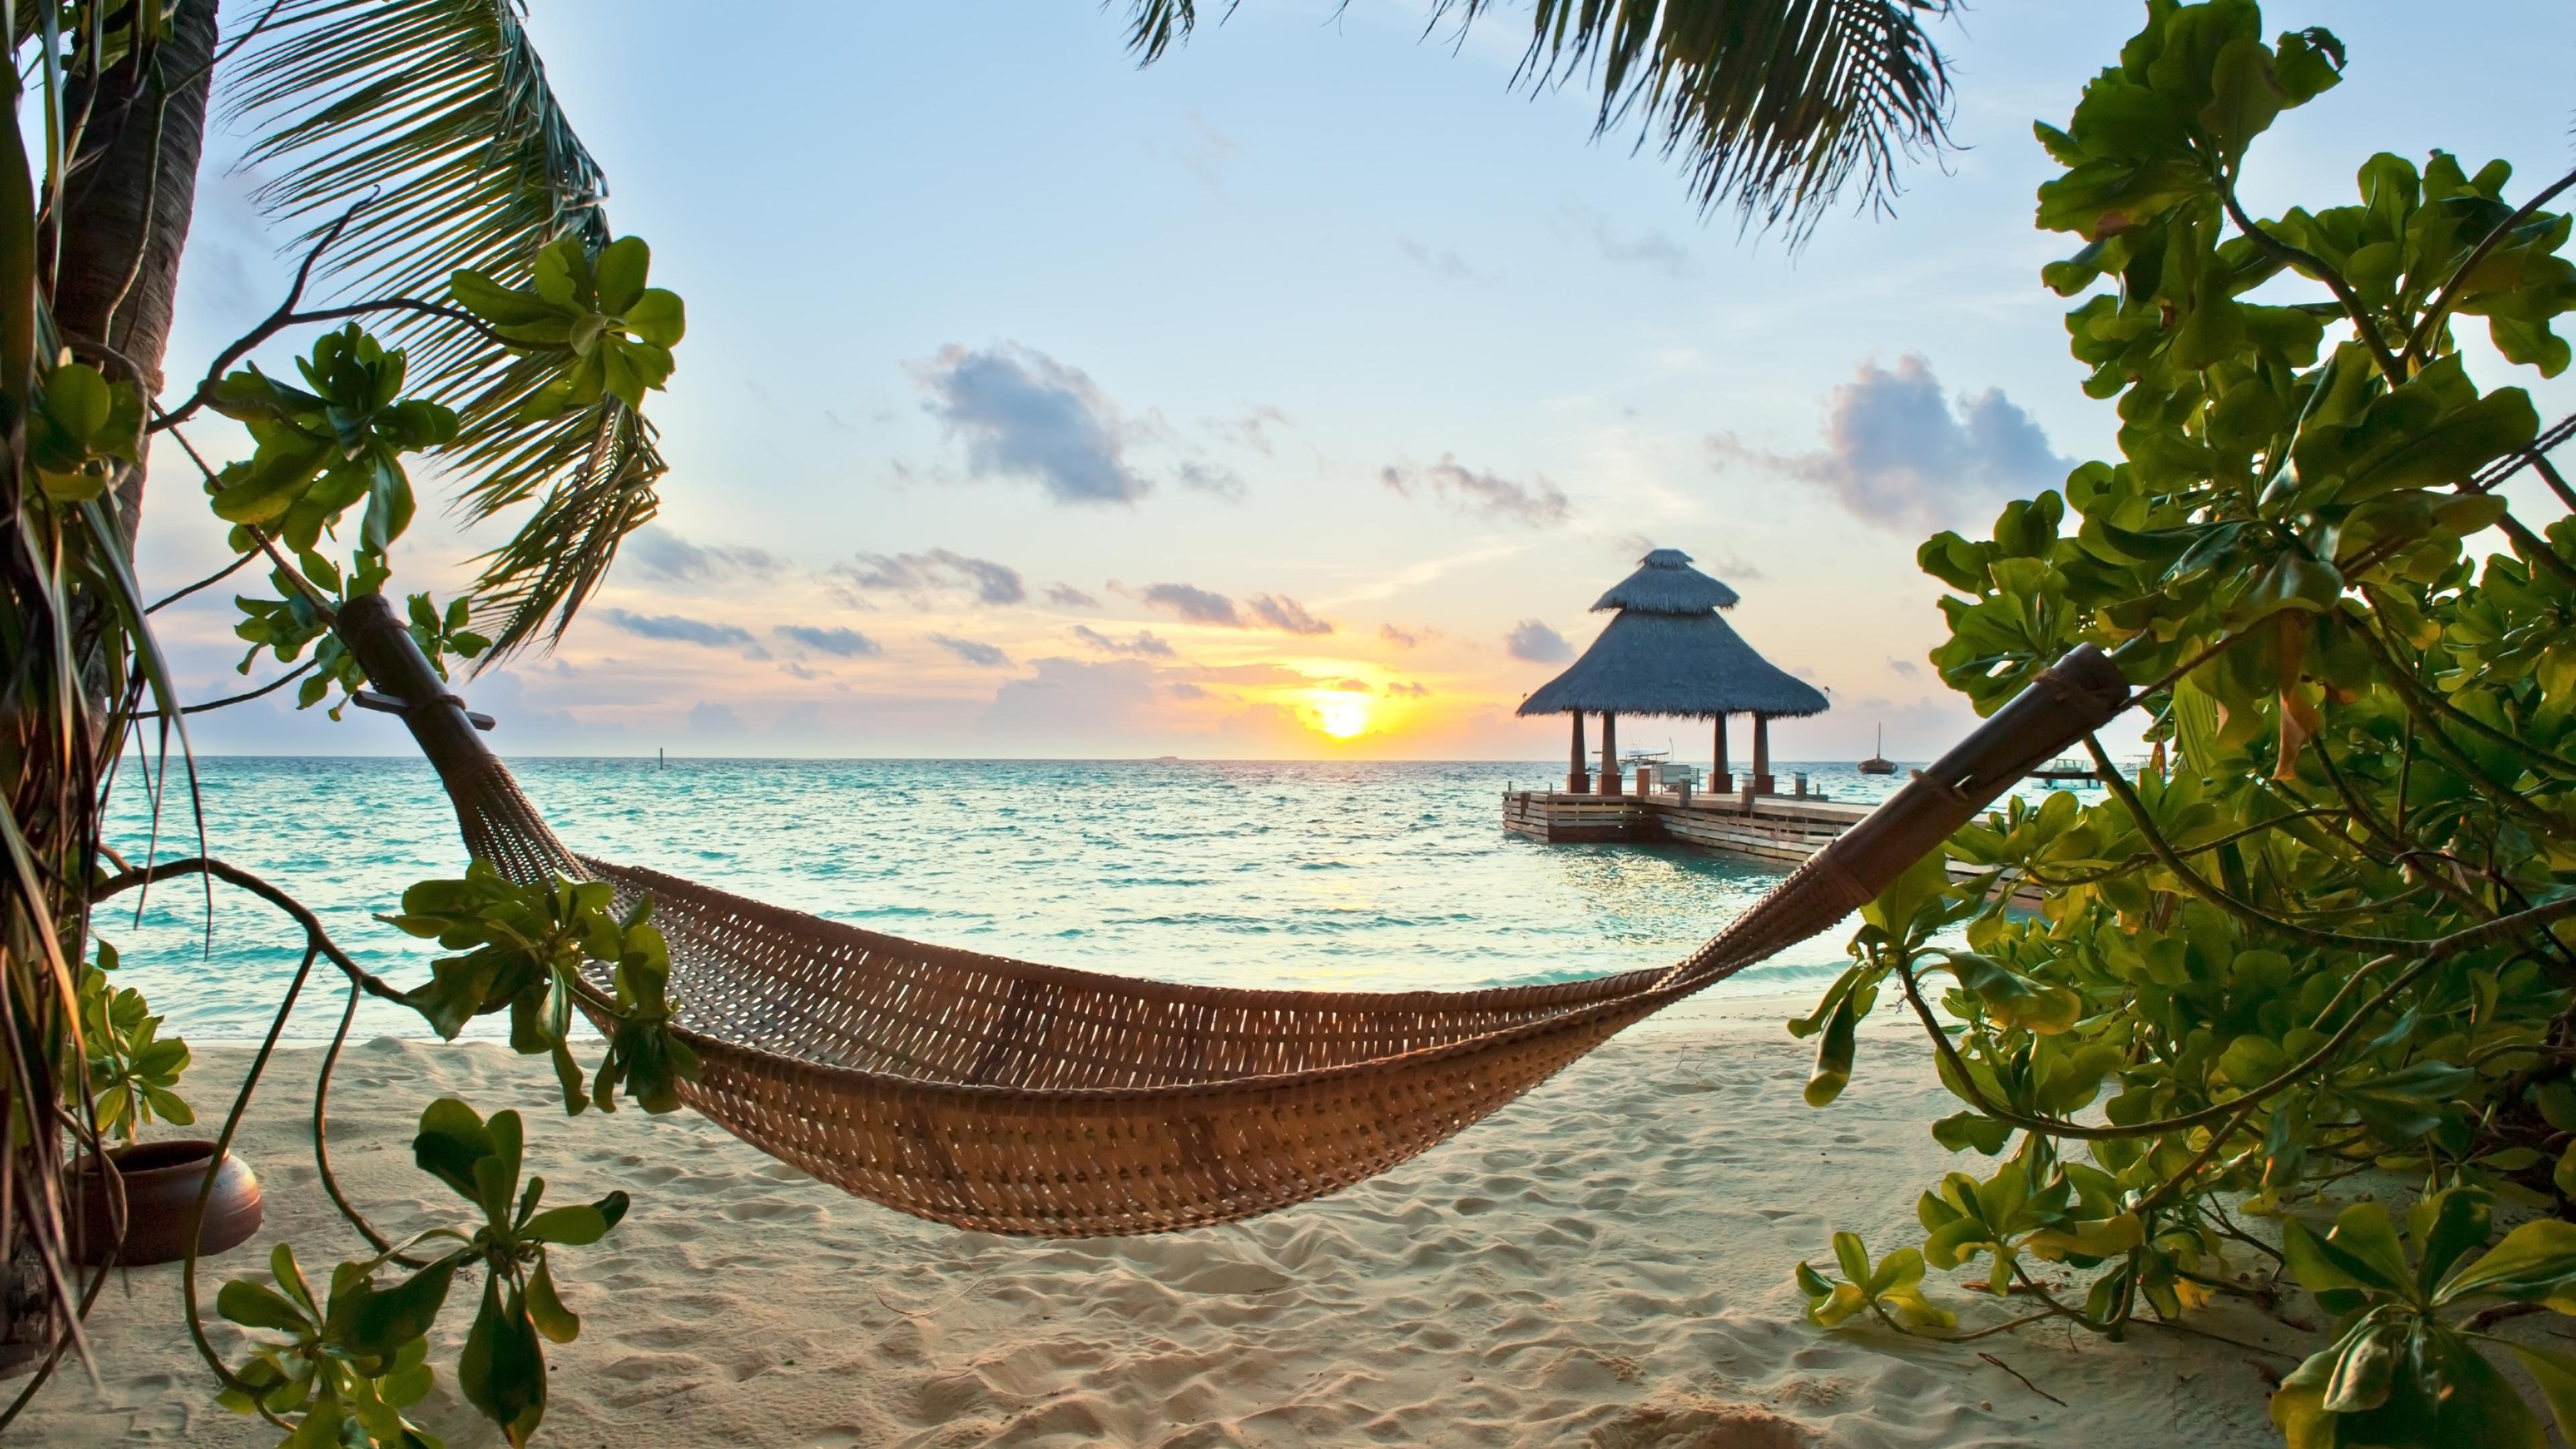 3840x2160 Tropics Beach Sand 4k Wallpaper Hd Nature 4k